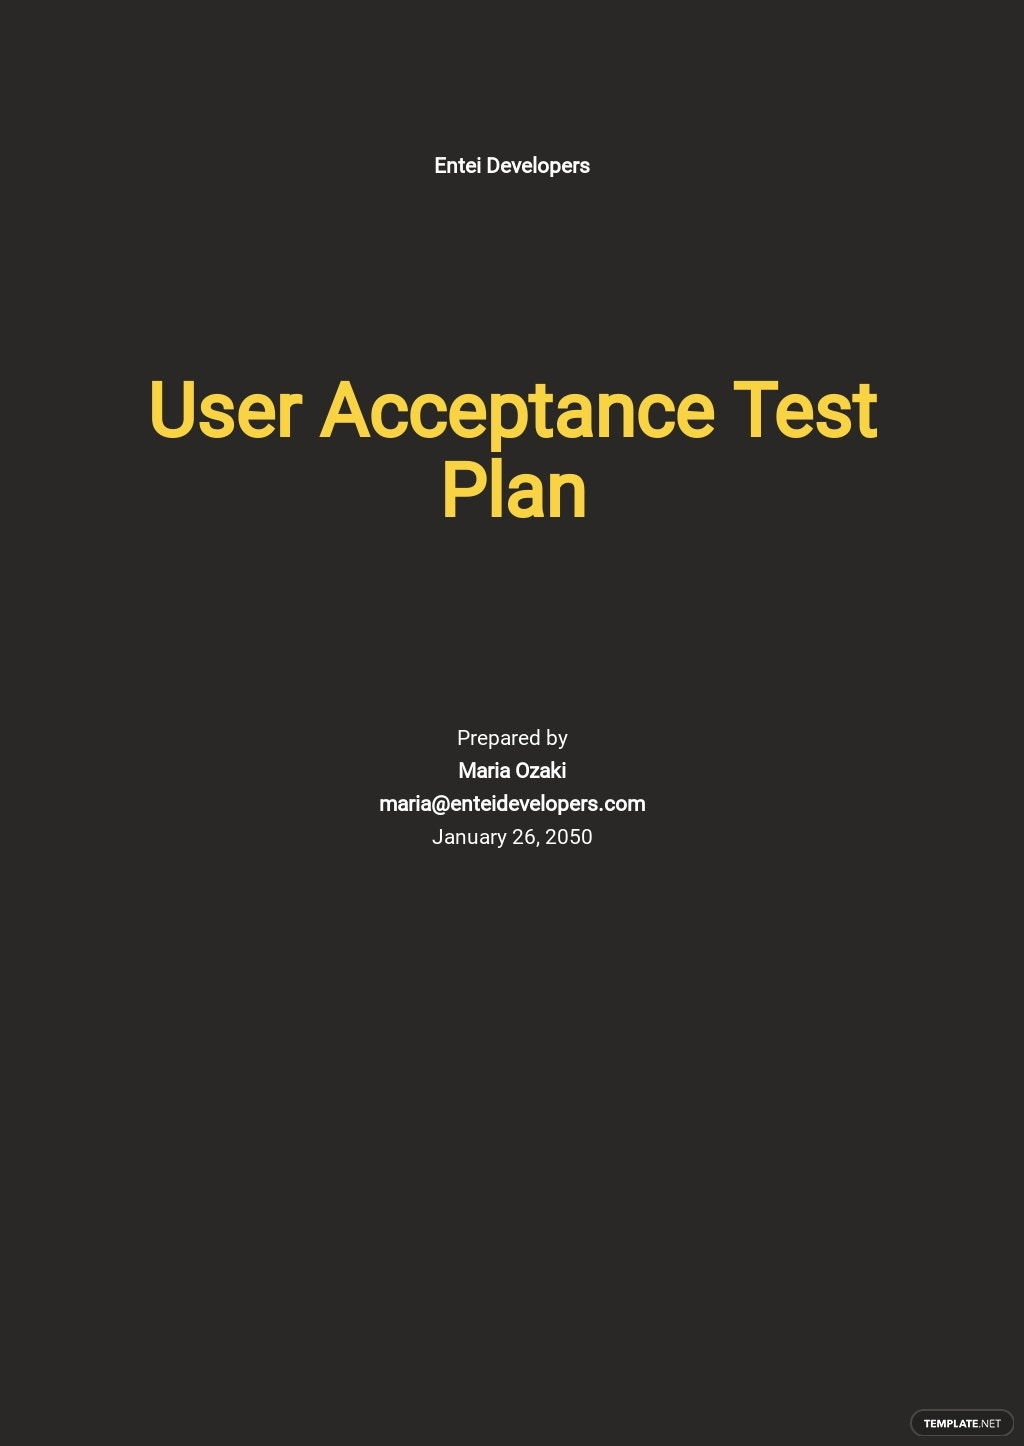 User Acceptance Test Plan Template.jpe